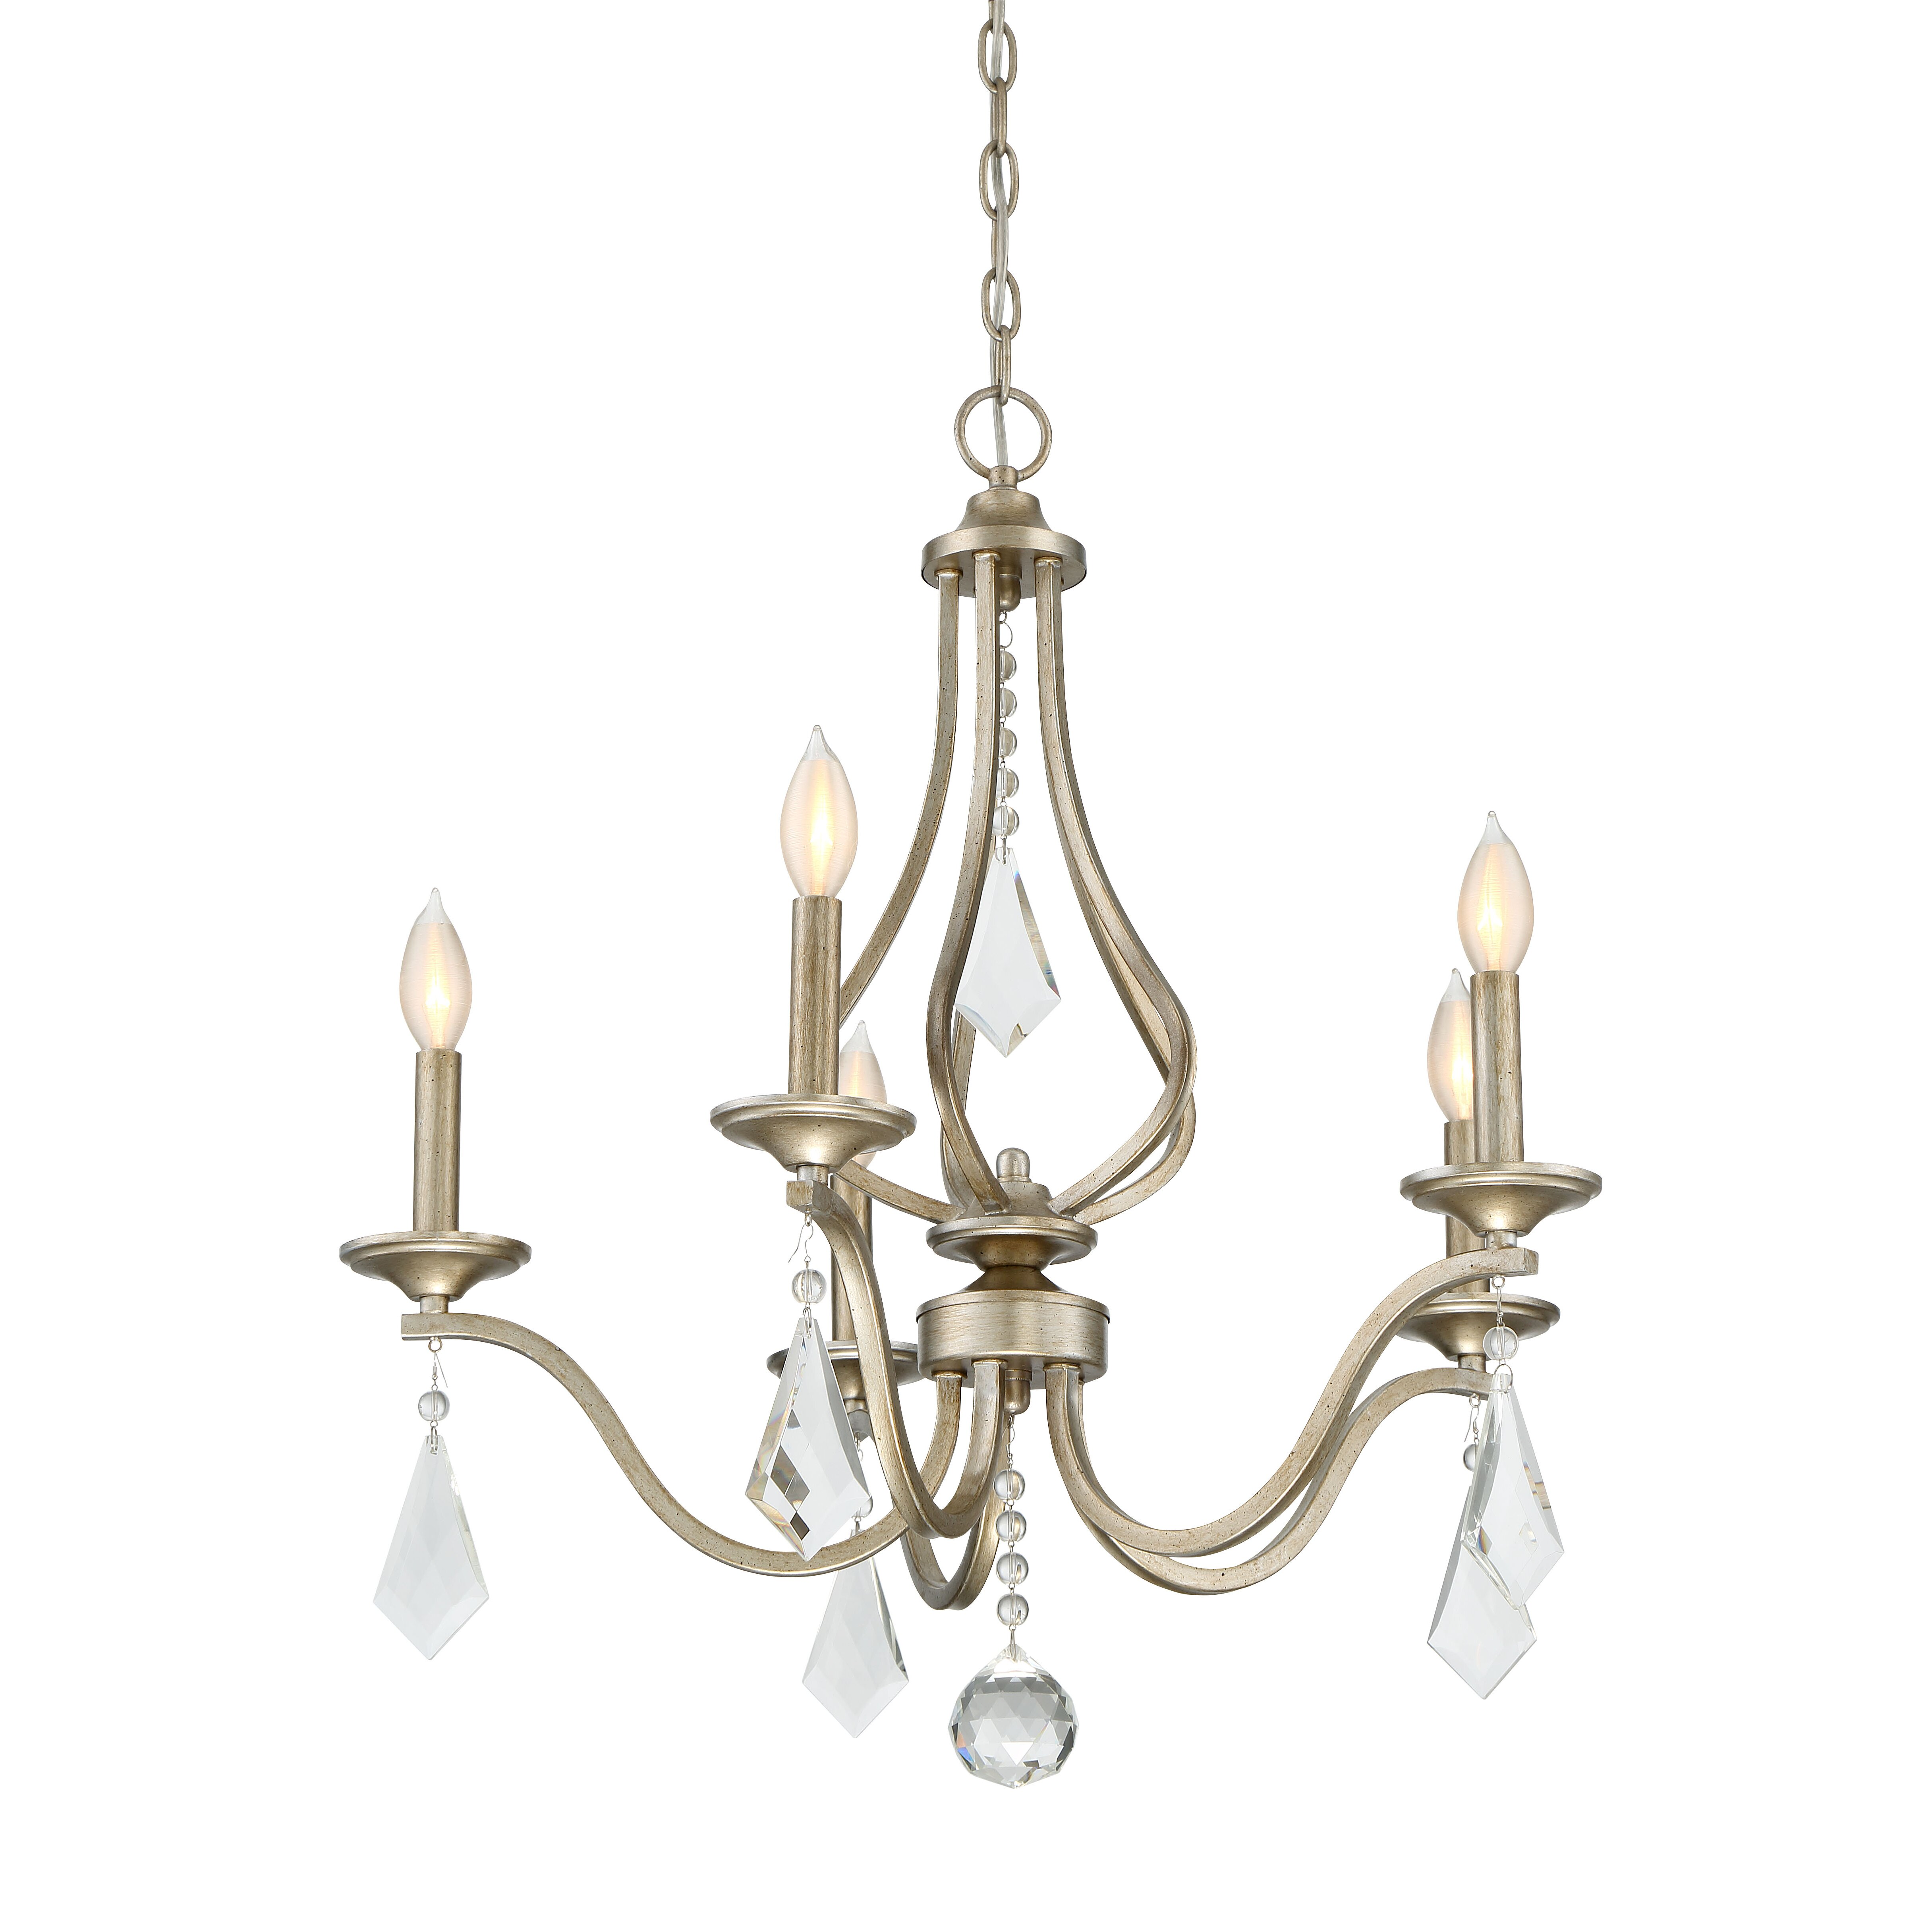 House Of Hampton Warner 5 Light Candle Style Chandelier